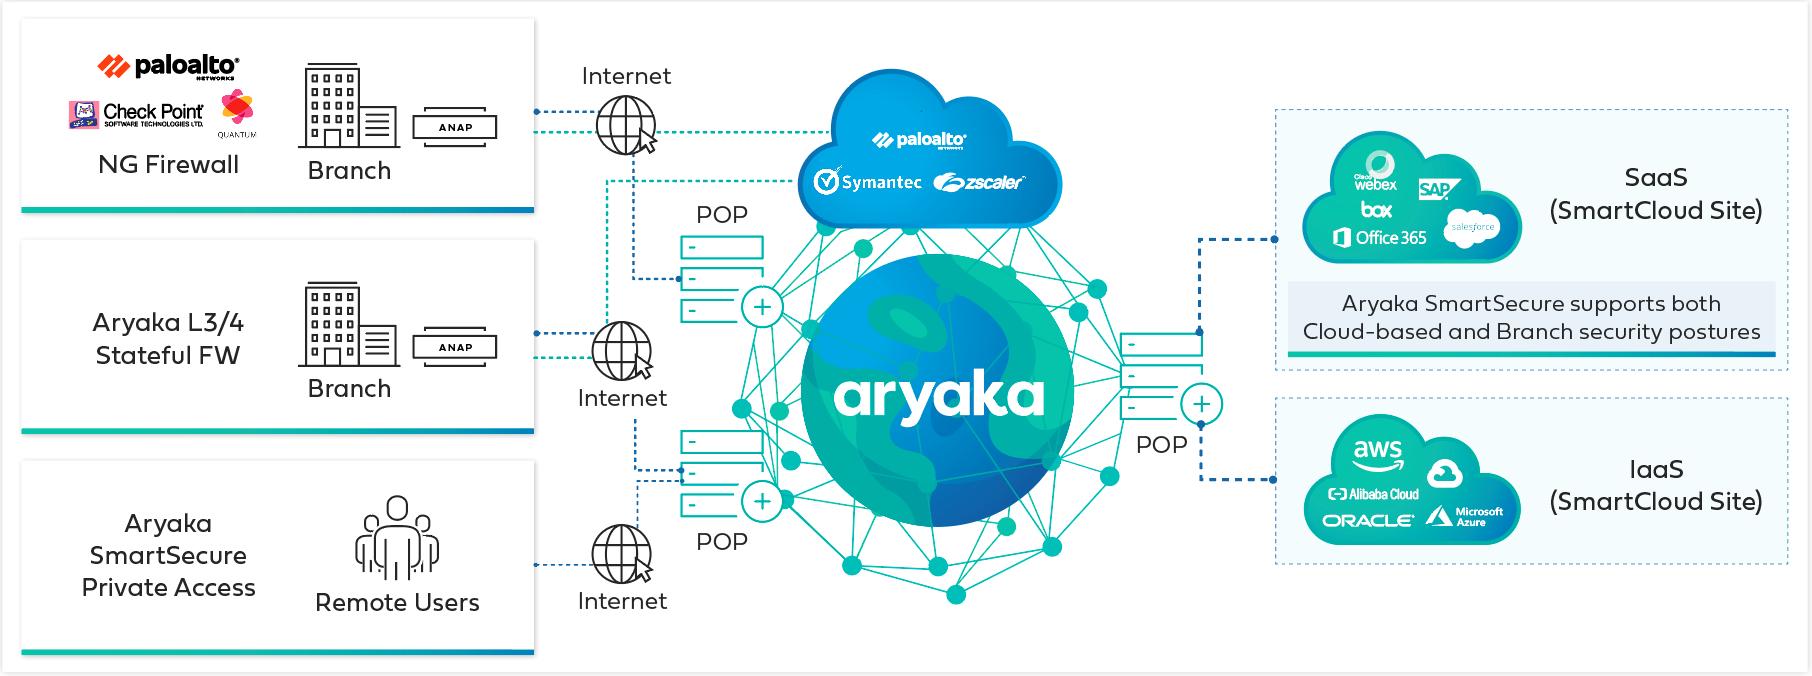 Enterprise VPN solution